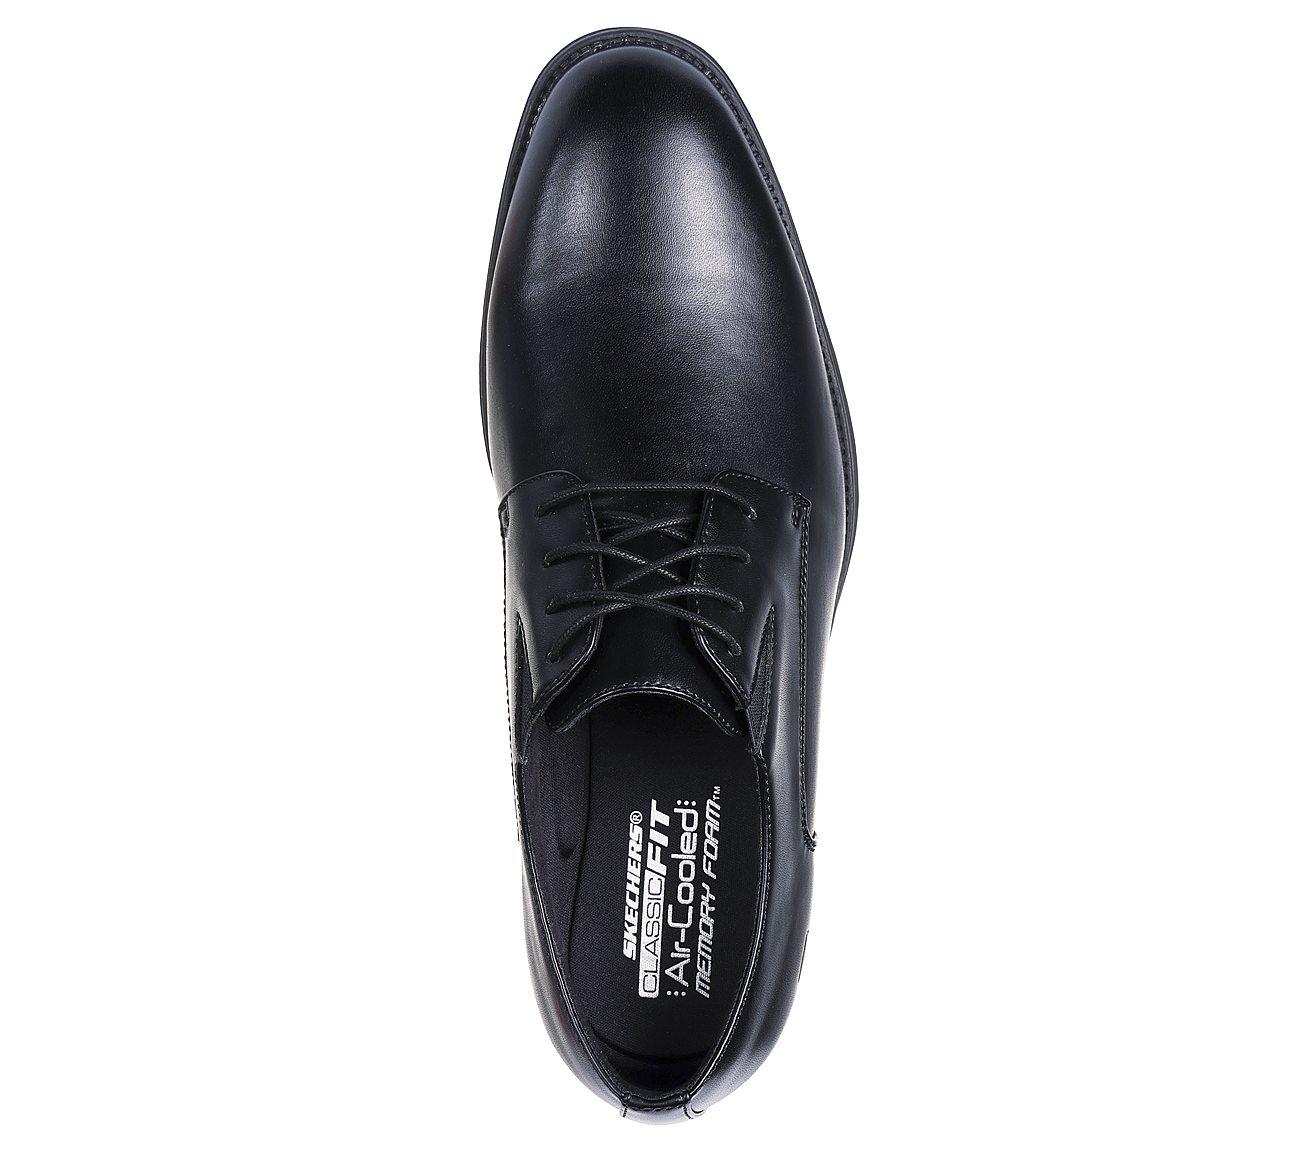 SKECHERS Larken - Alcon USA Casuals Shoes